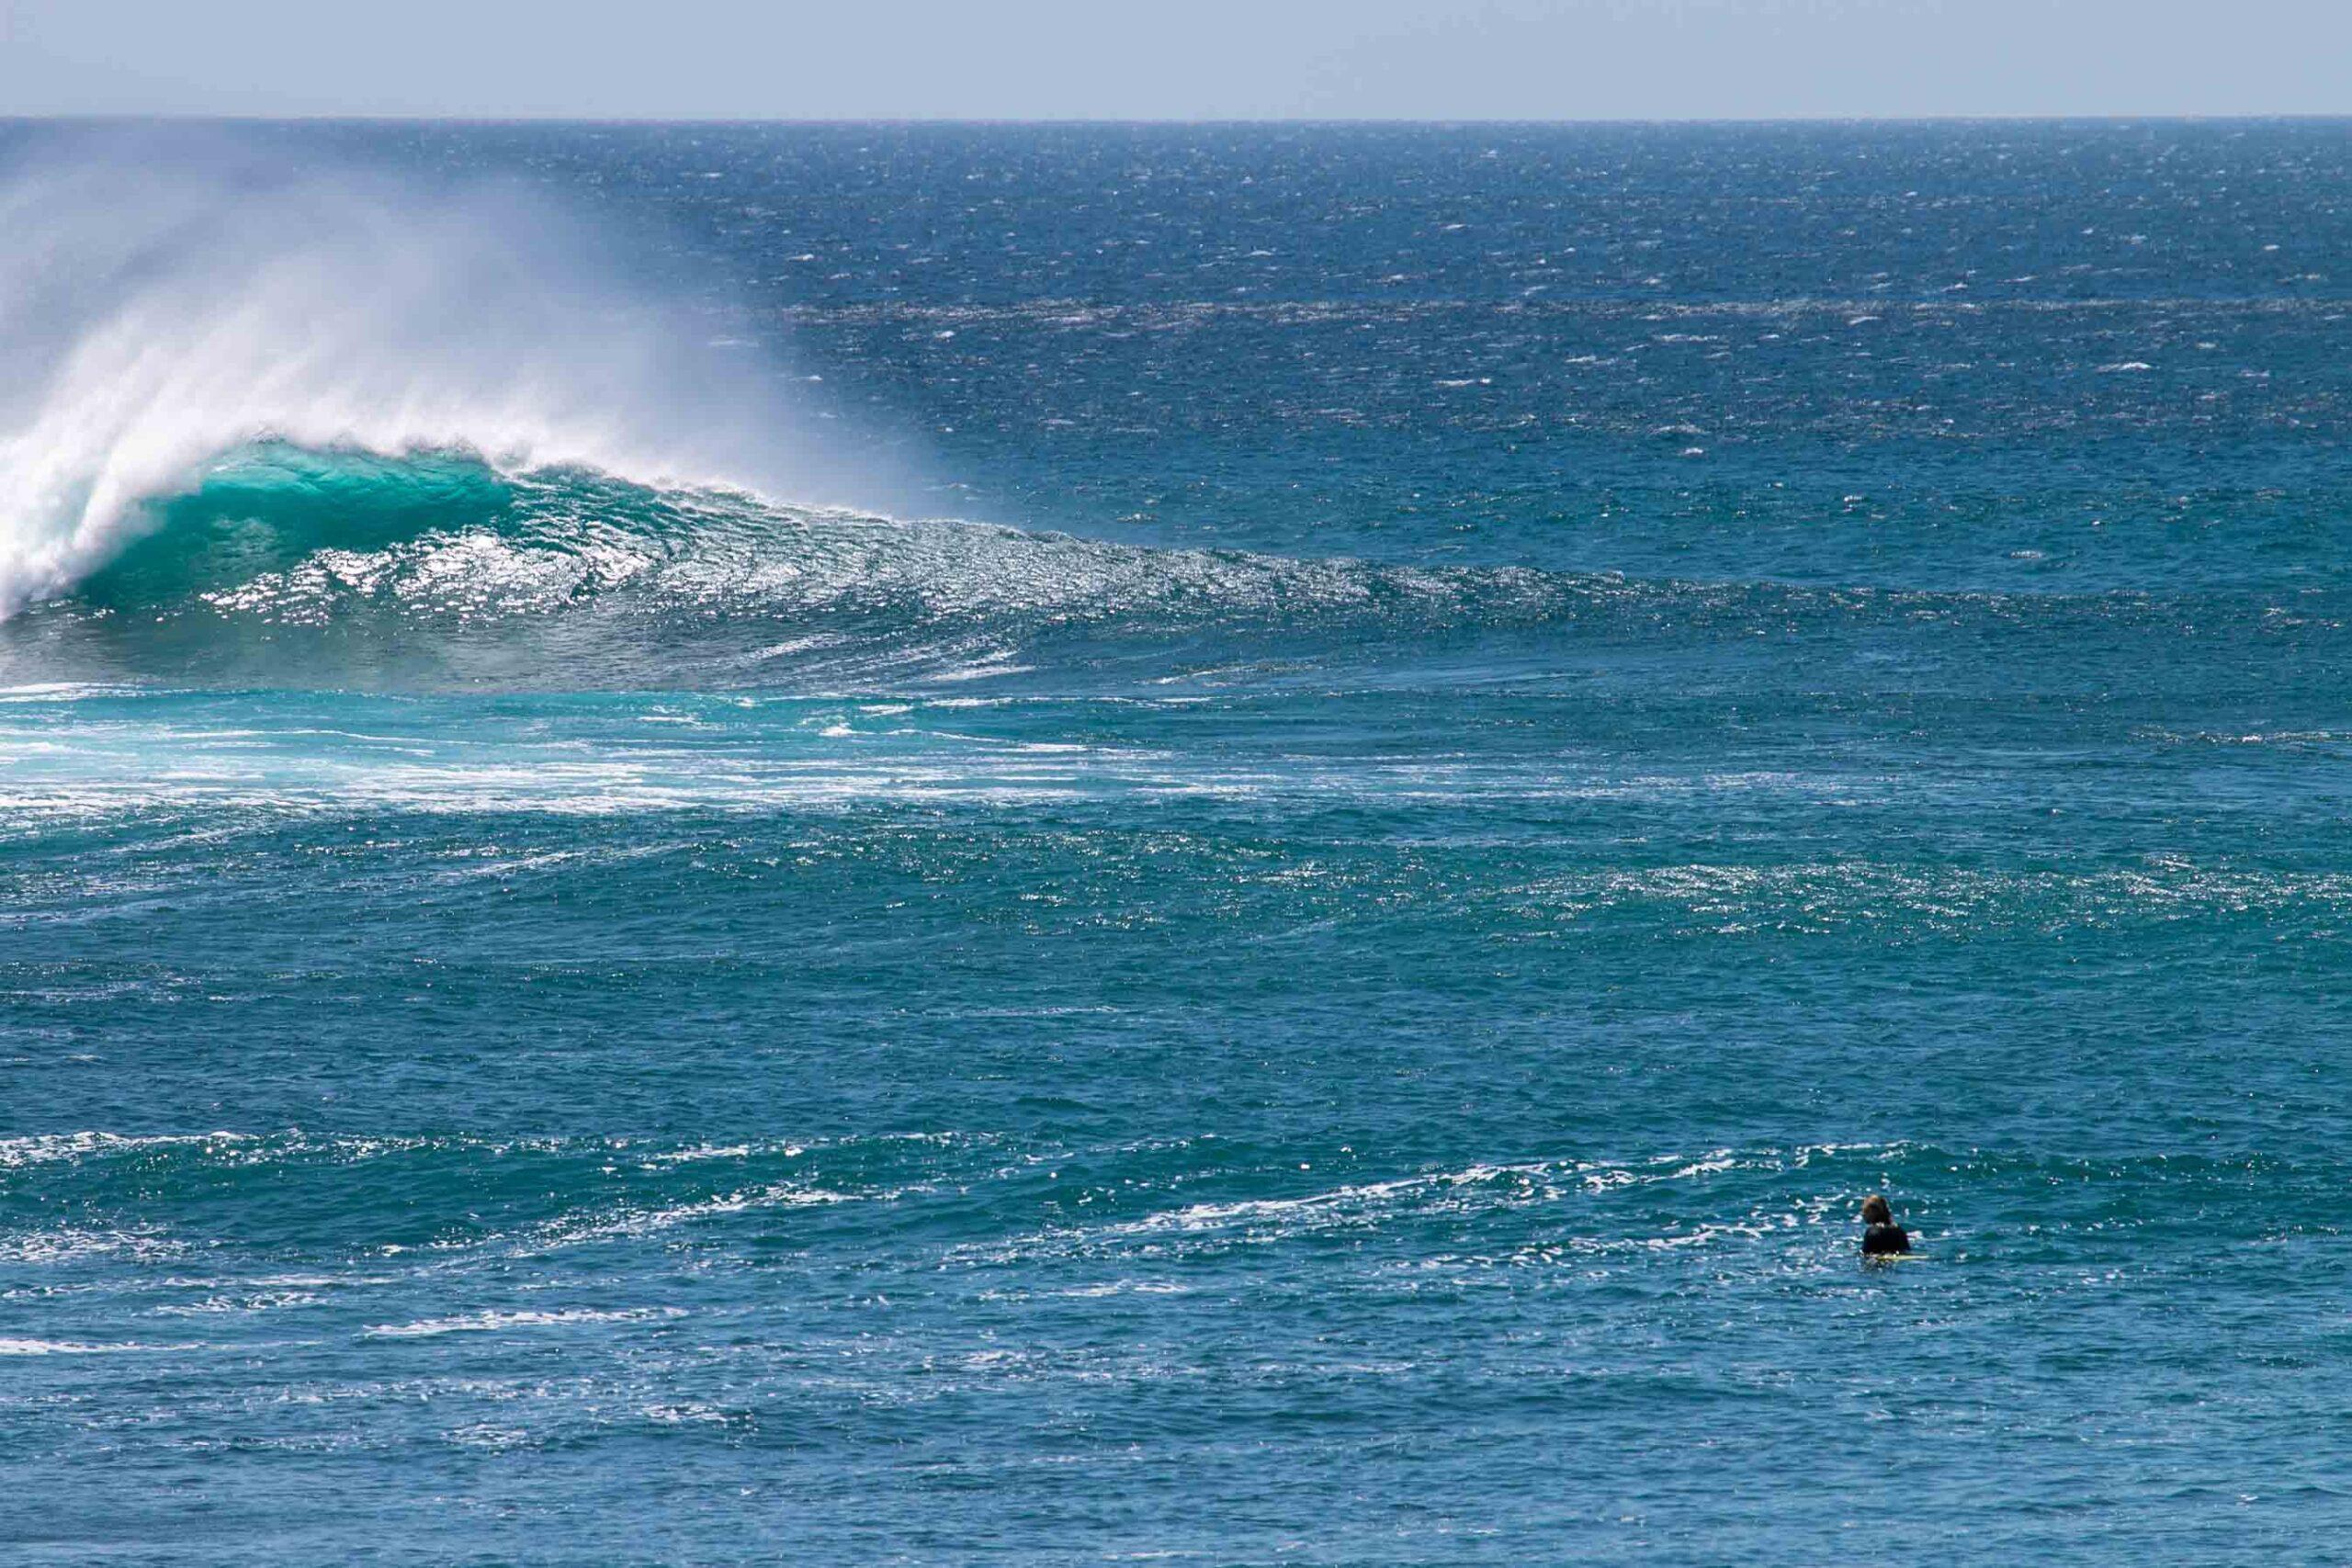 Outer reef Popoyo break in Nicaragua